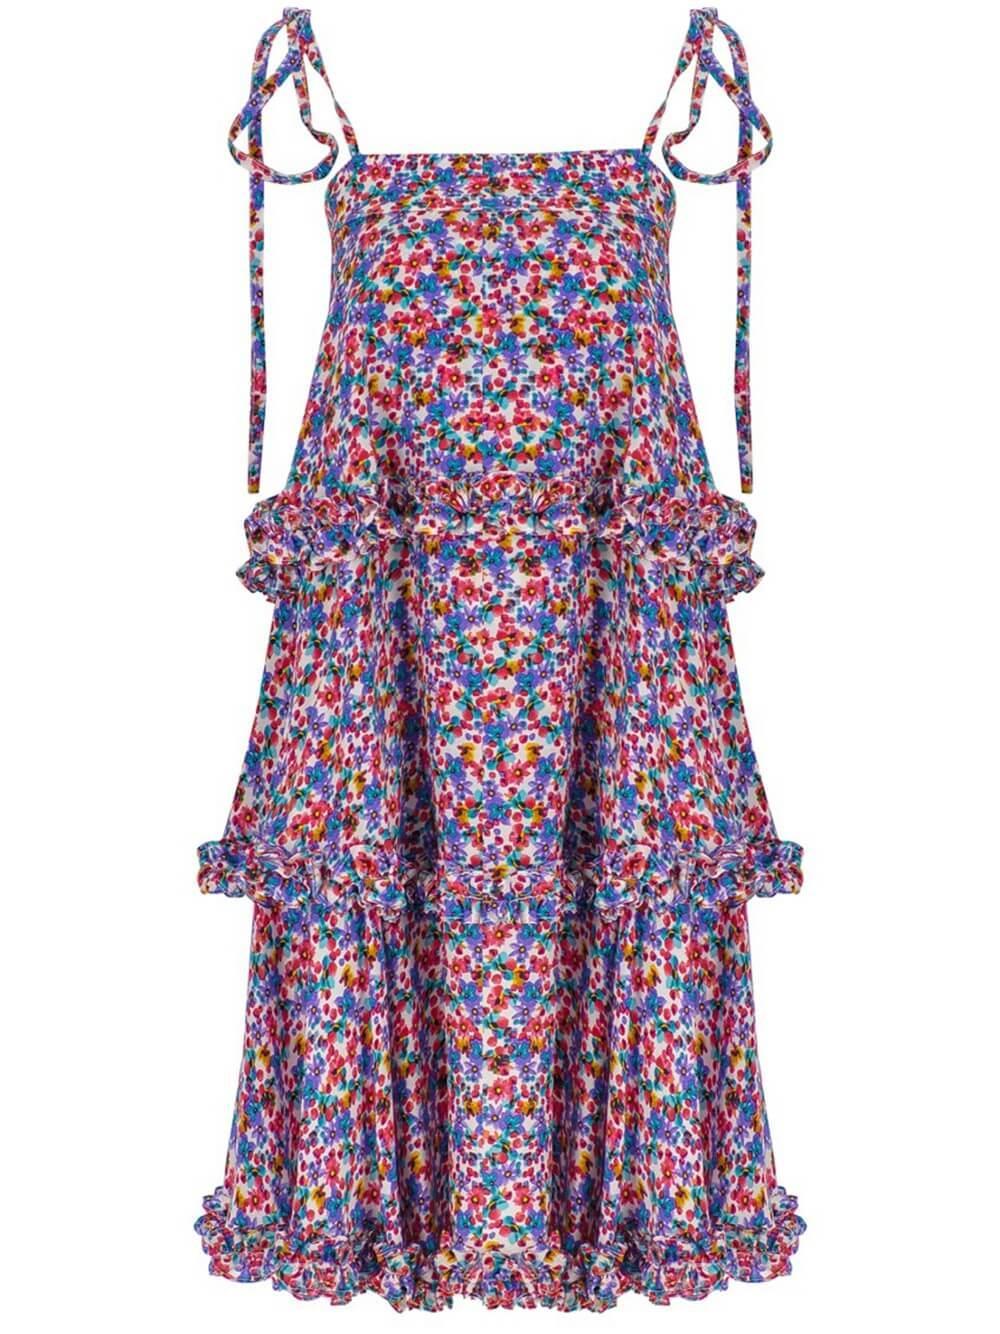 Shoulder Tie Tiered Mini Dress